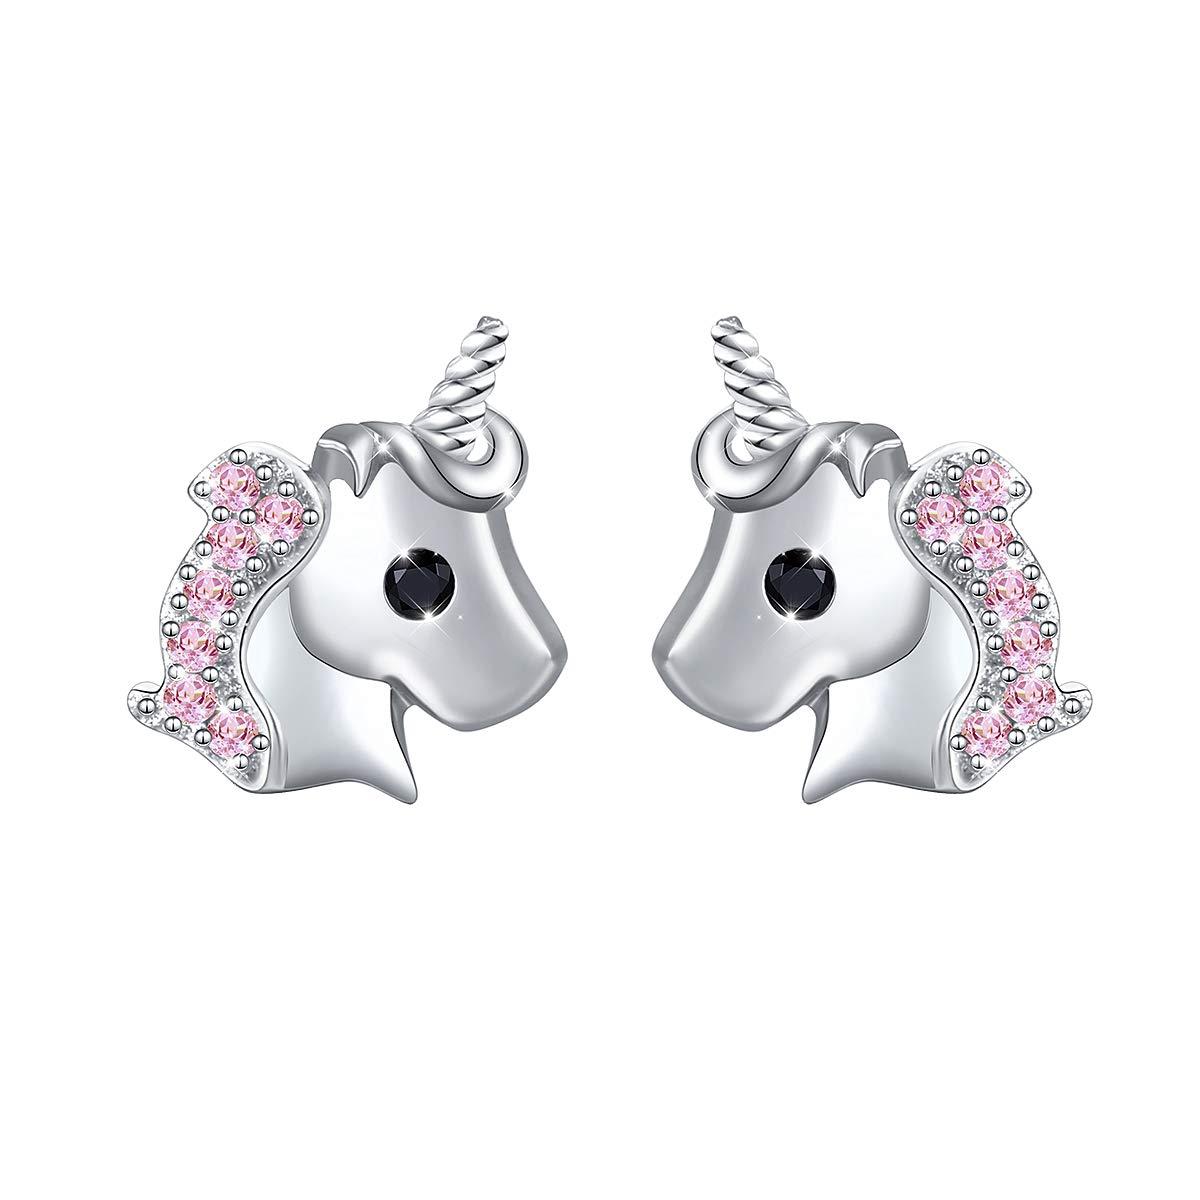 Yearace 925 Sterling Silver Unicorn Gift Cute Cz Unicorn Earring Jewelry for Women Teen Girls Kids Children (Pink) by Yearace